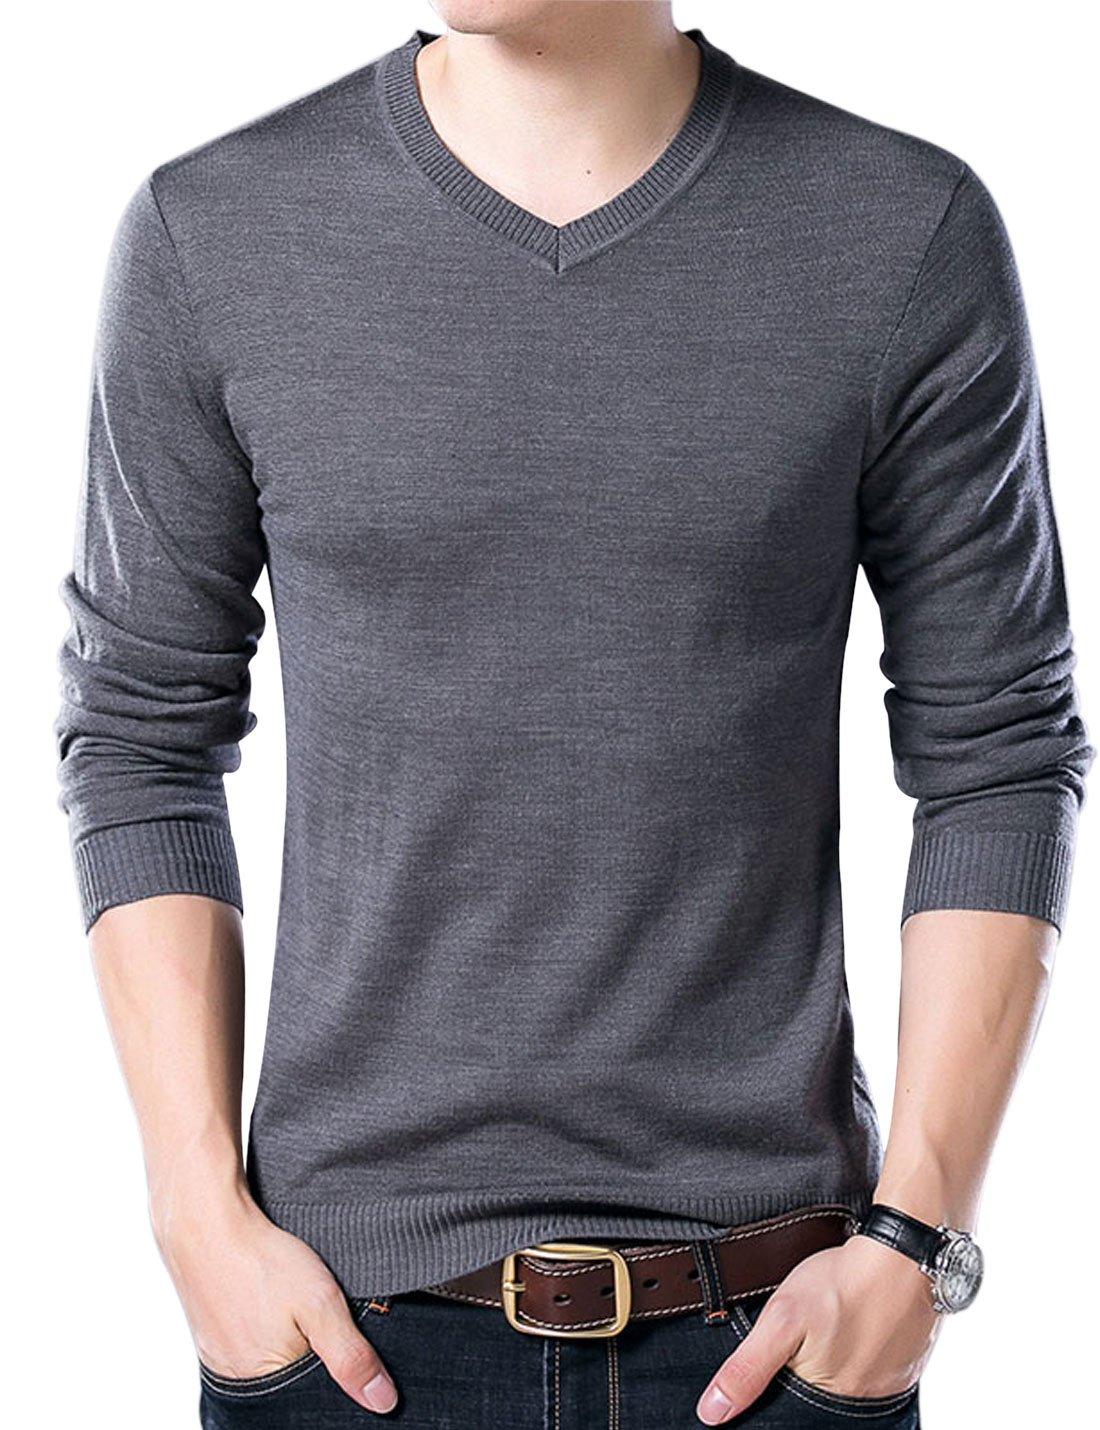 Yeokou Men's Casual Slim V Neck Winter Wool Cashmere Pullover Jumper Sweater,Dark Grey,Small